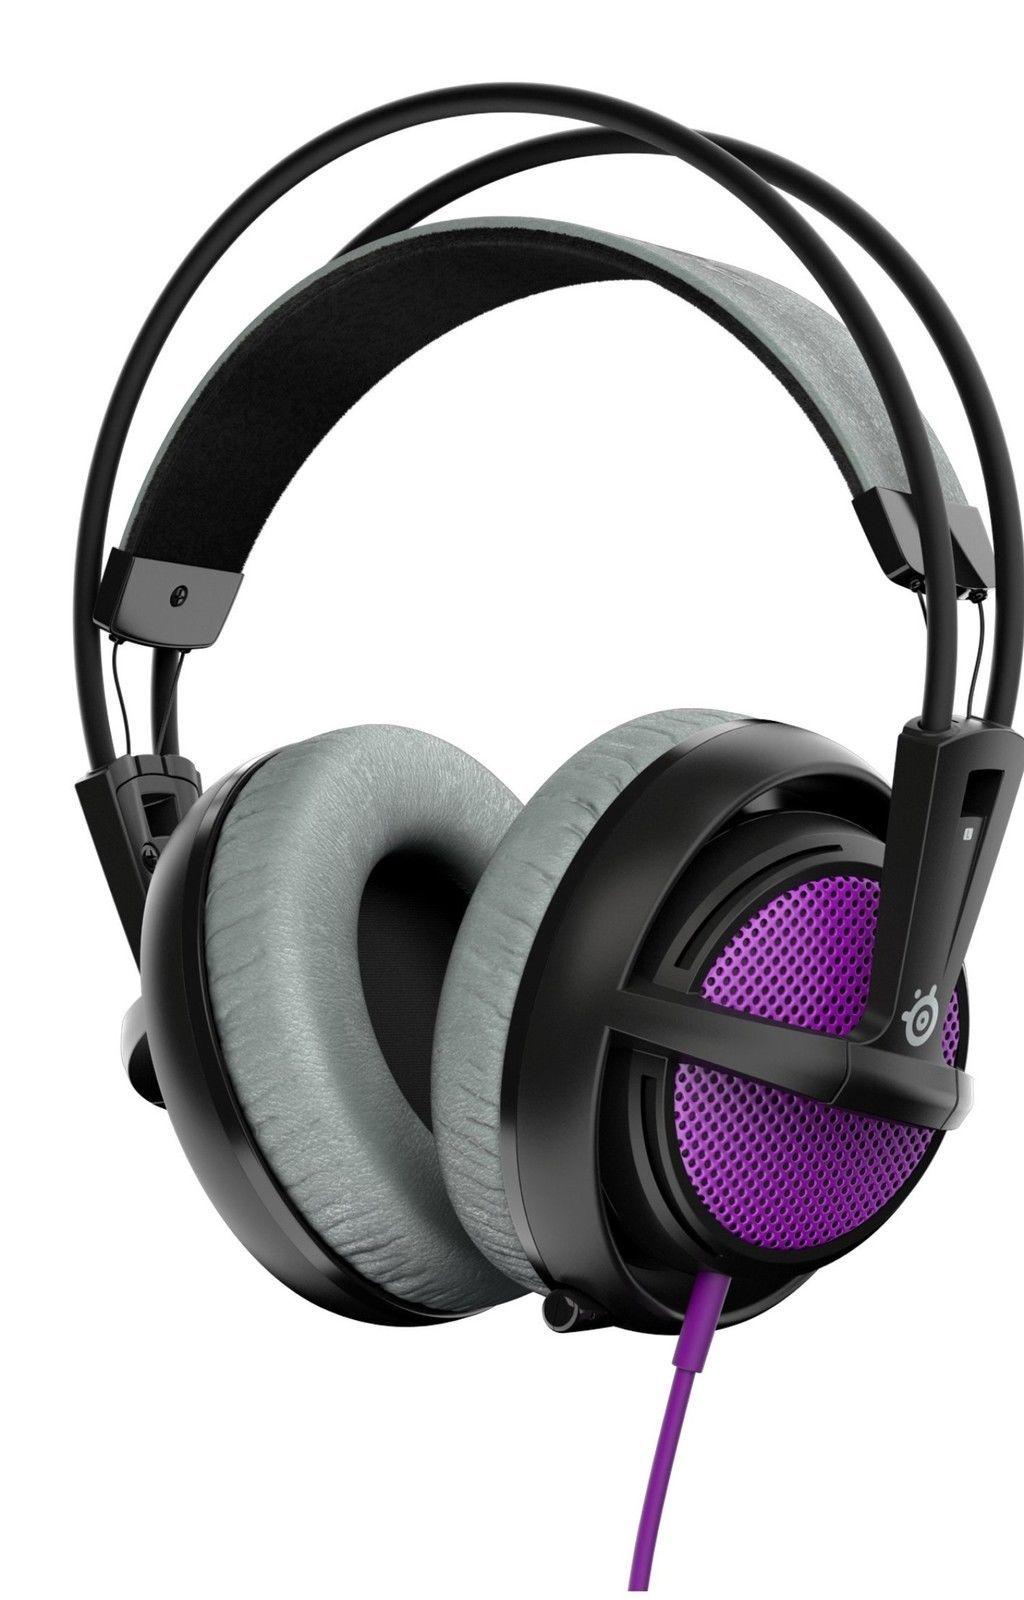 75b10c30868 SteelSeries Siberia 200 Gaming Headset Sakura Purple (Siberia v2). Fast  shipp